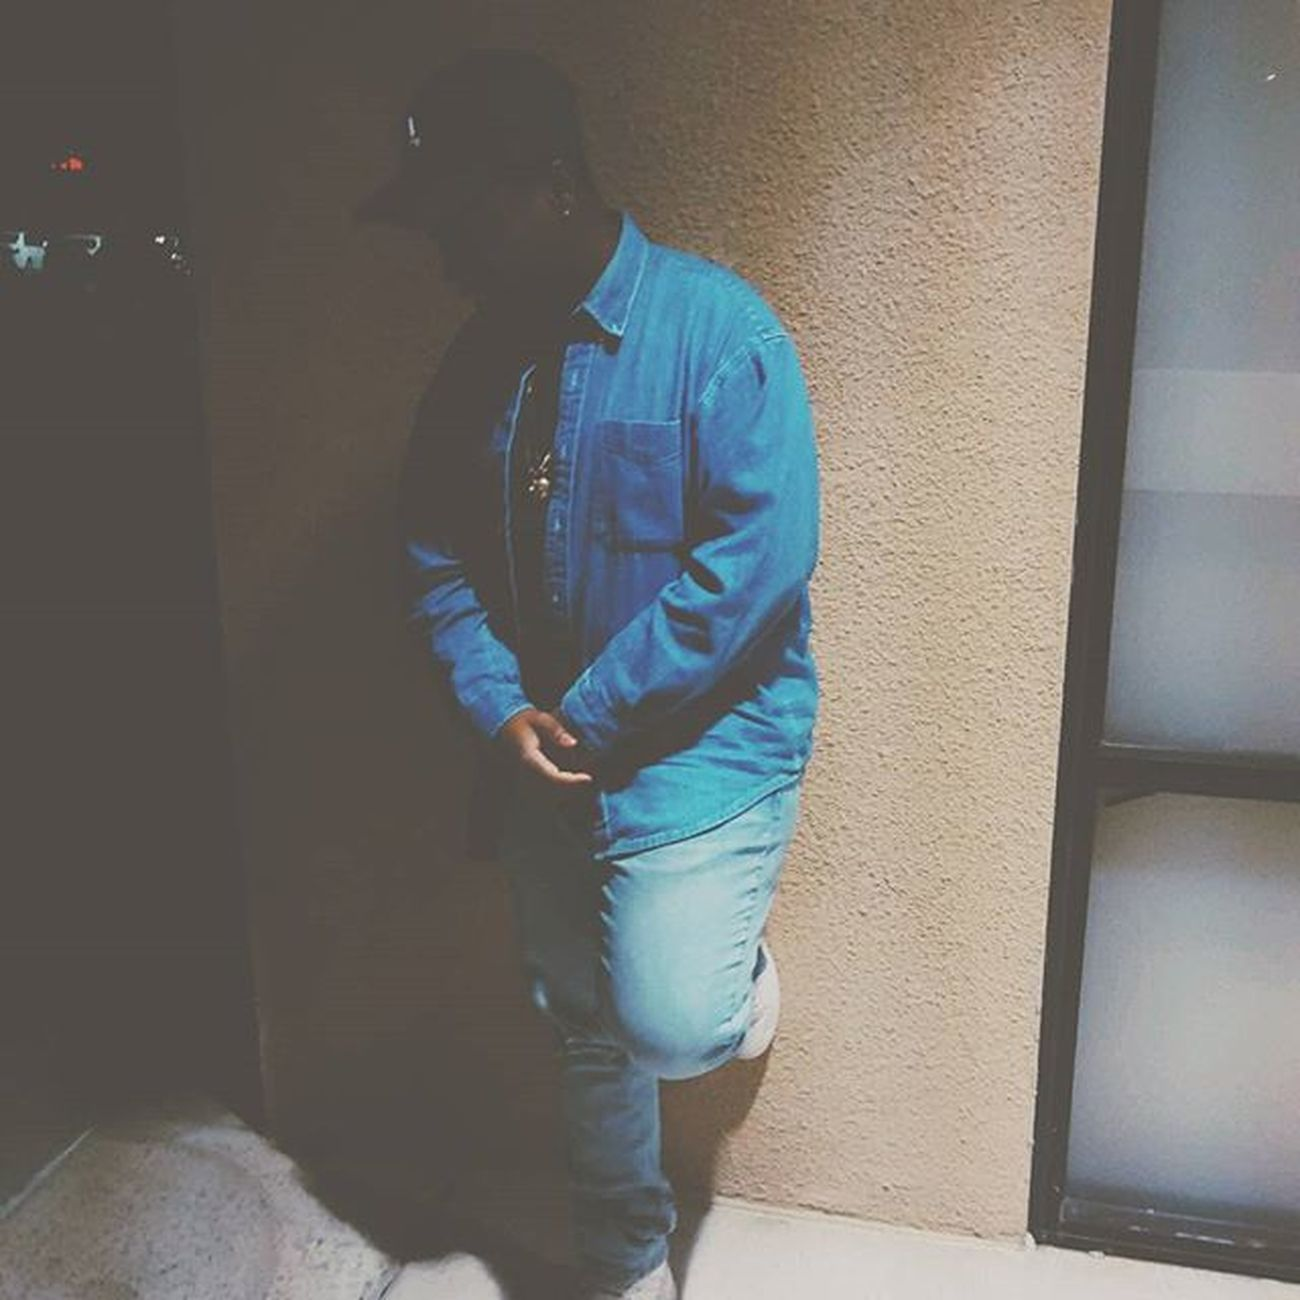 1 9 9 6 - N - 2 0 1 5 Stussy Bape Vintage Supremenyc Supremexjordan Adidas Caps Trill DOPE Crooksandcastles  Cheersclub Air Nike Airmax Nikeswoosh Tillys Sacramento California Cali Sactown Illest Trippy Streetwear Mensfashion Fashion